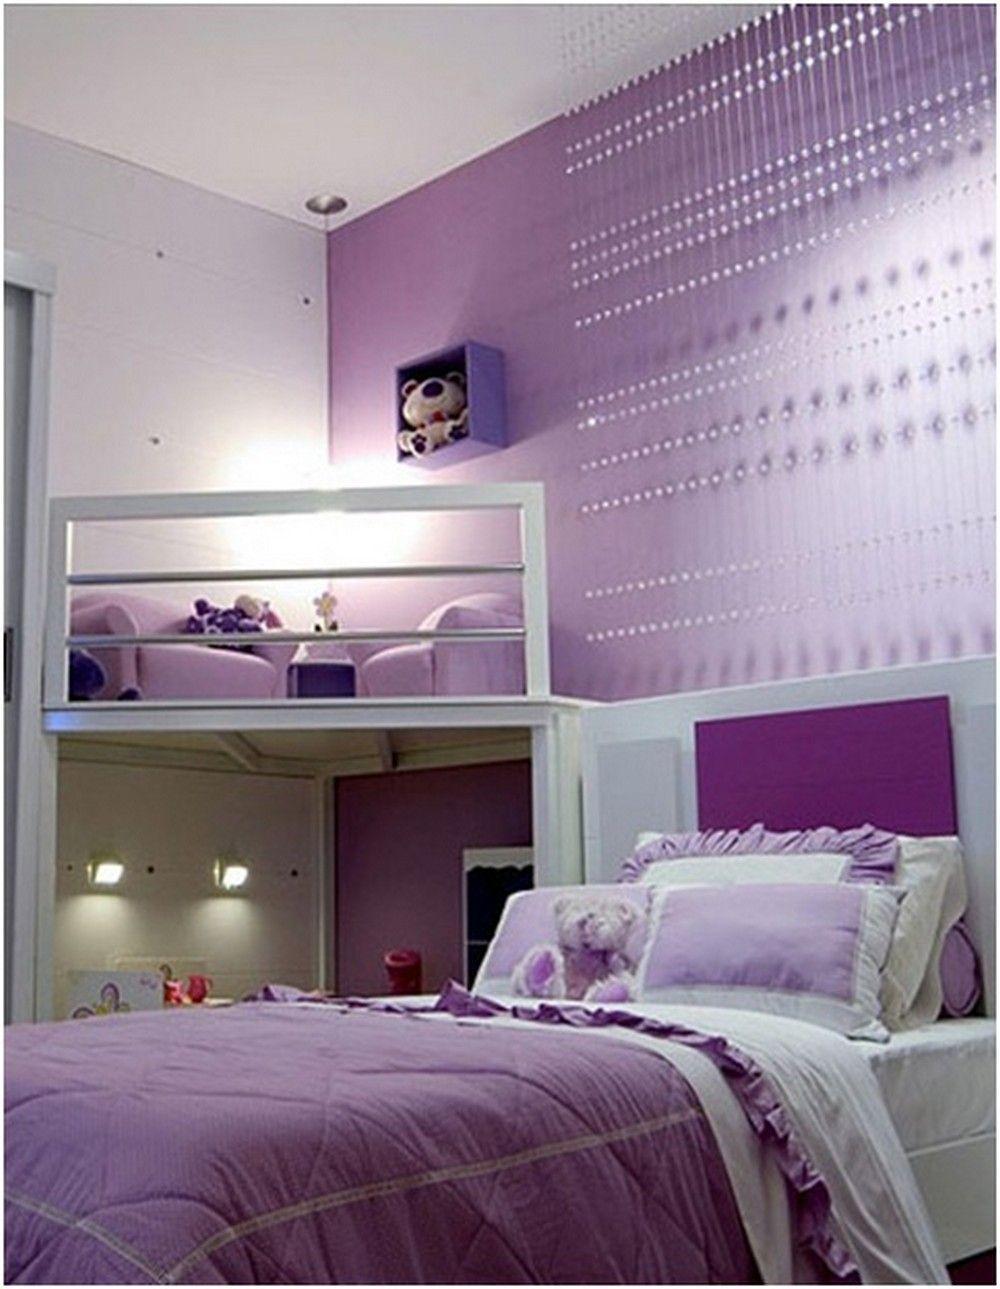 25 Sweetest Bedding Ideas For Girls\' Bedrooms | Reiseziele